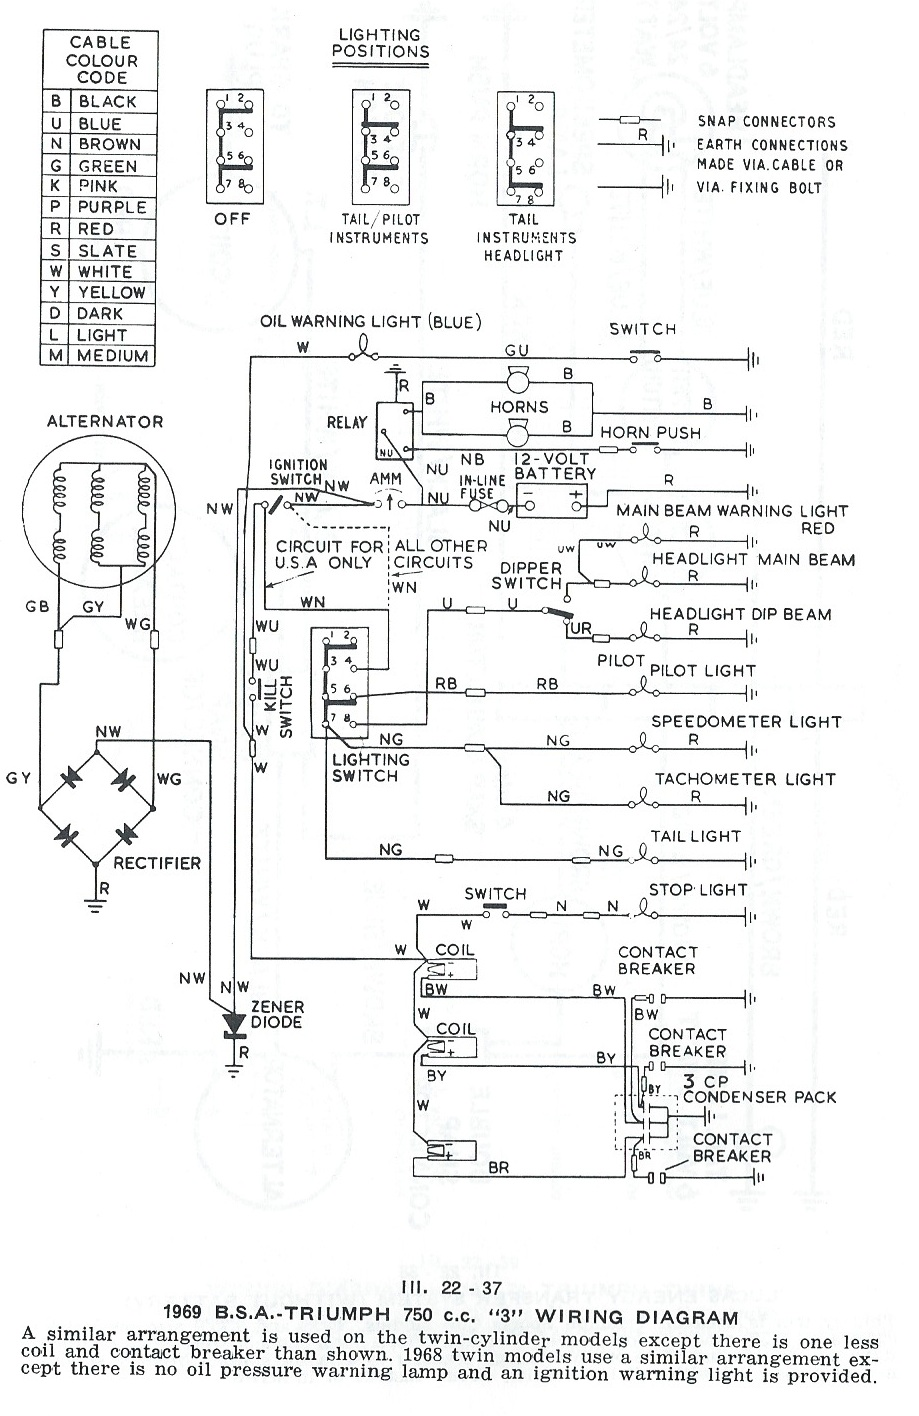 triumph wiring diagram triumph image wiring triumph wiring diagram dual carbs triumph wiring diagrams on triumph 650 wiring diagram